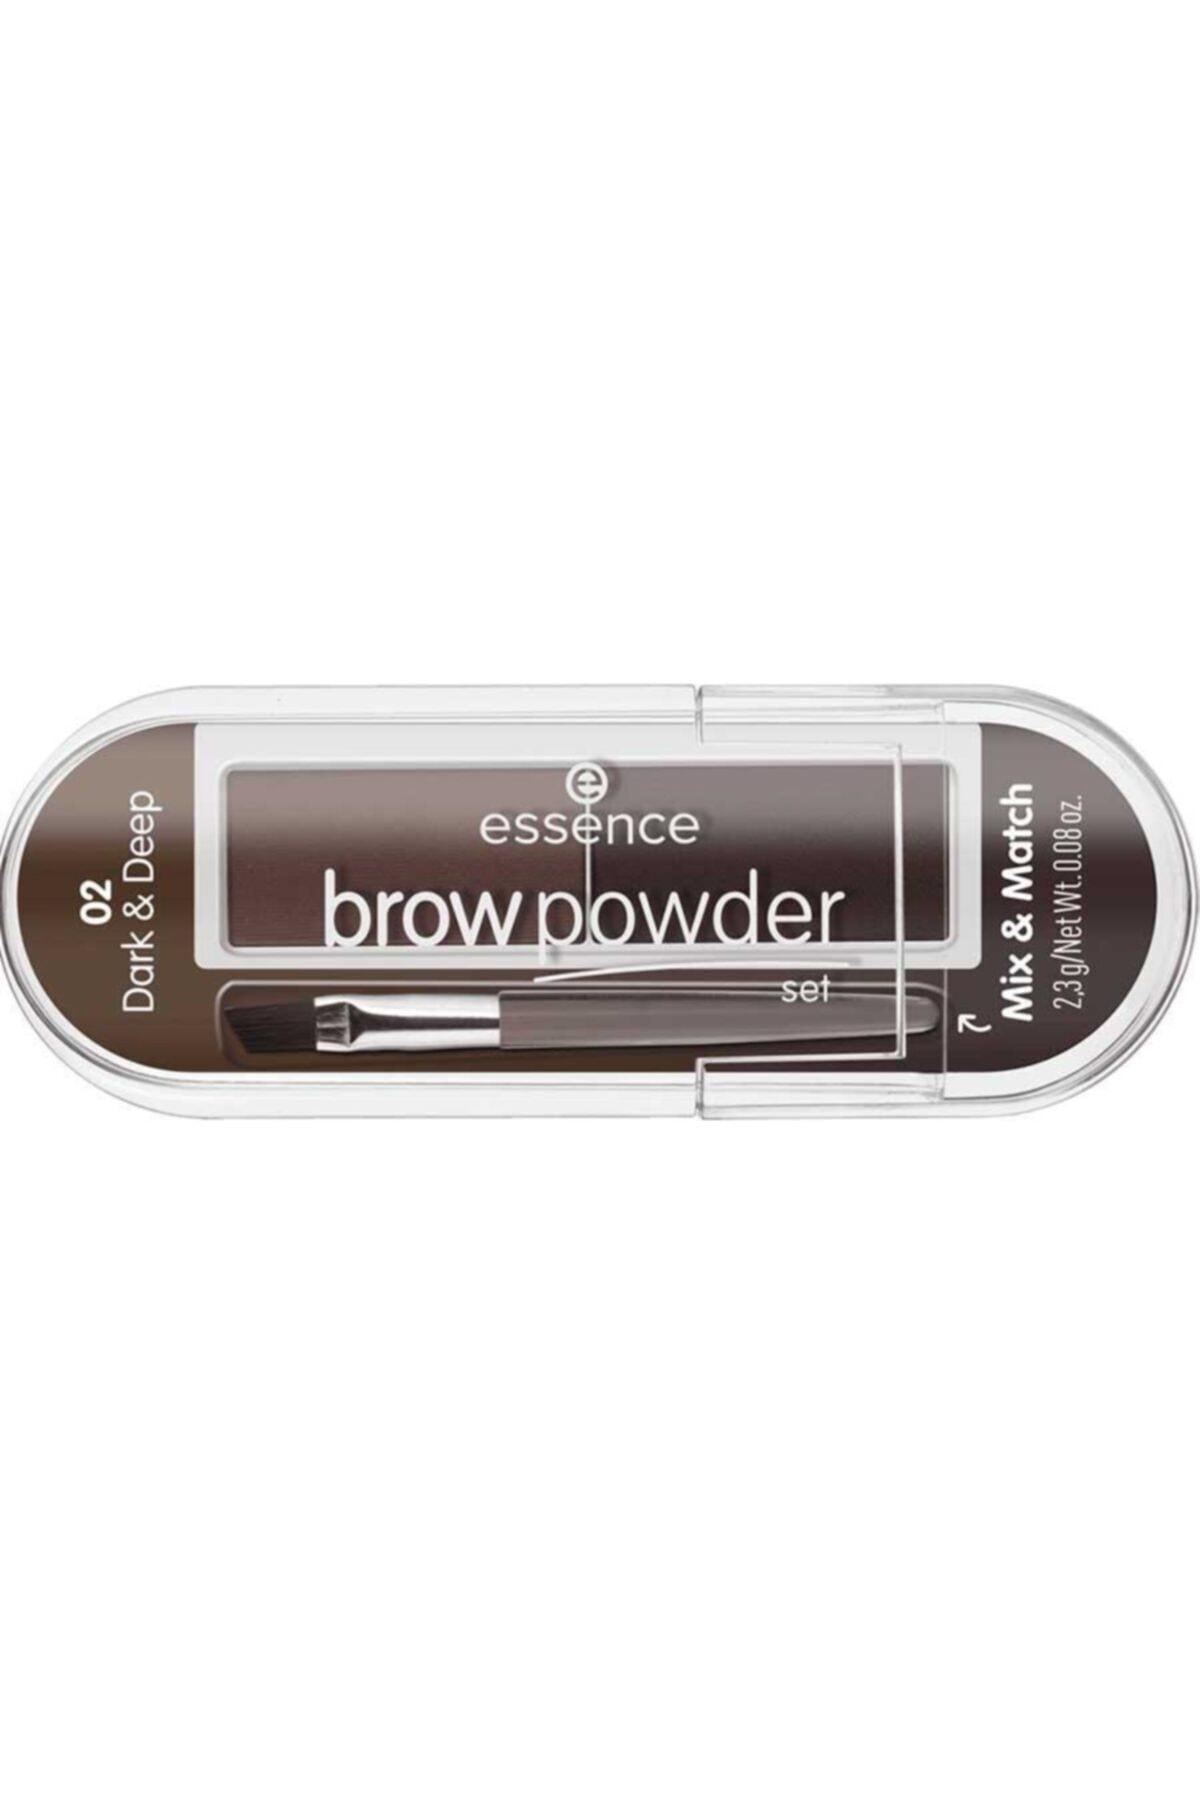 Essence Brow Powder - Kaş Farı No: 01 Light/Medium  4059729271204 1